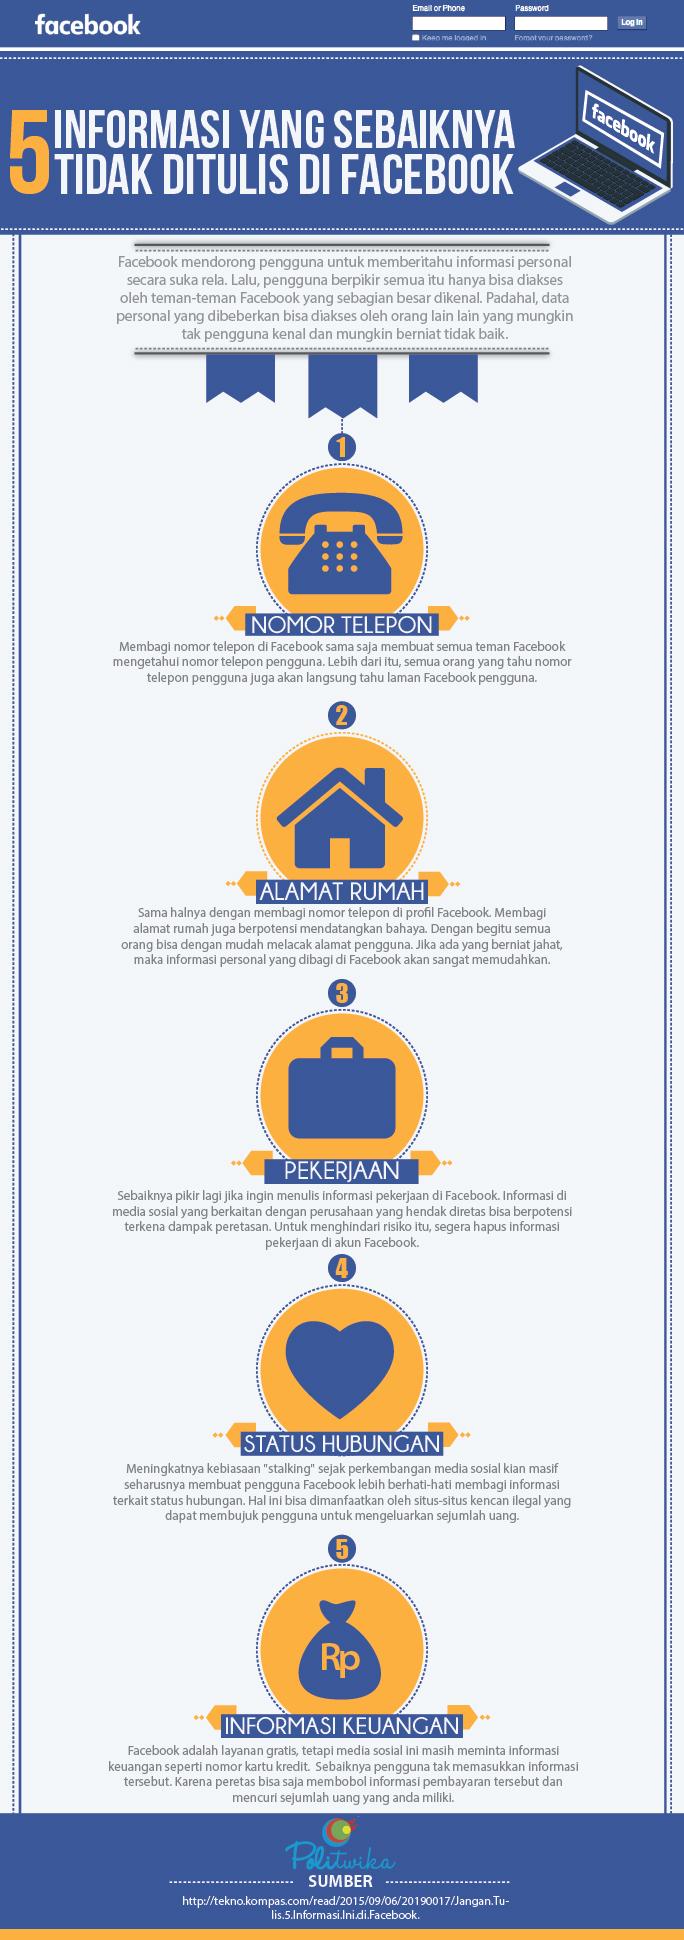 infografik-facebook-informasi-dilarang